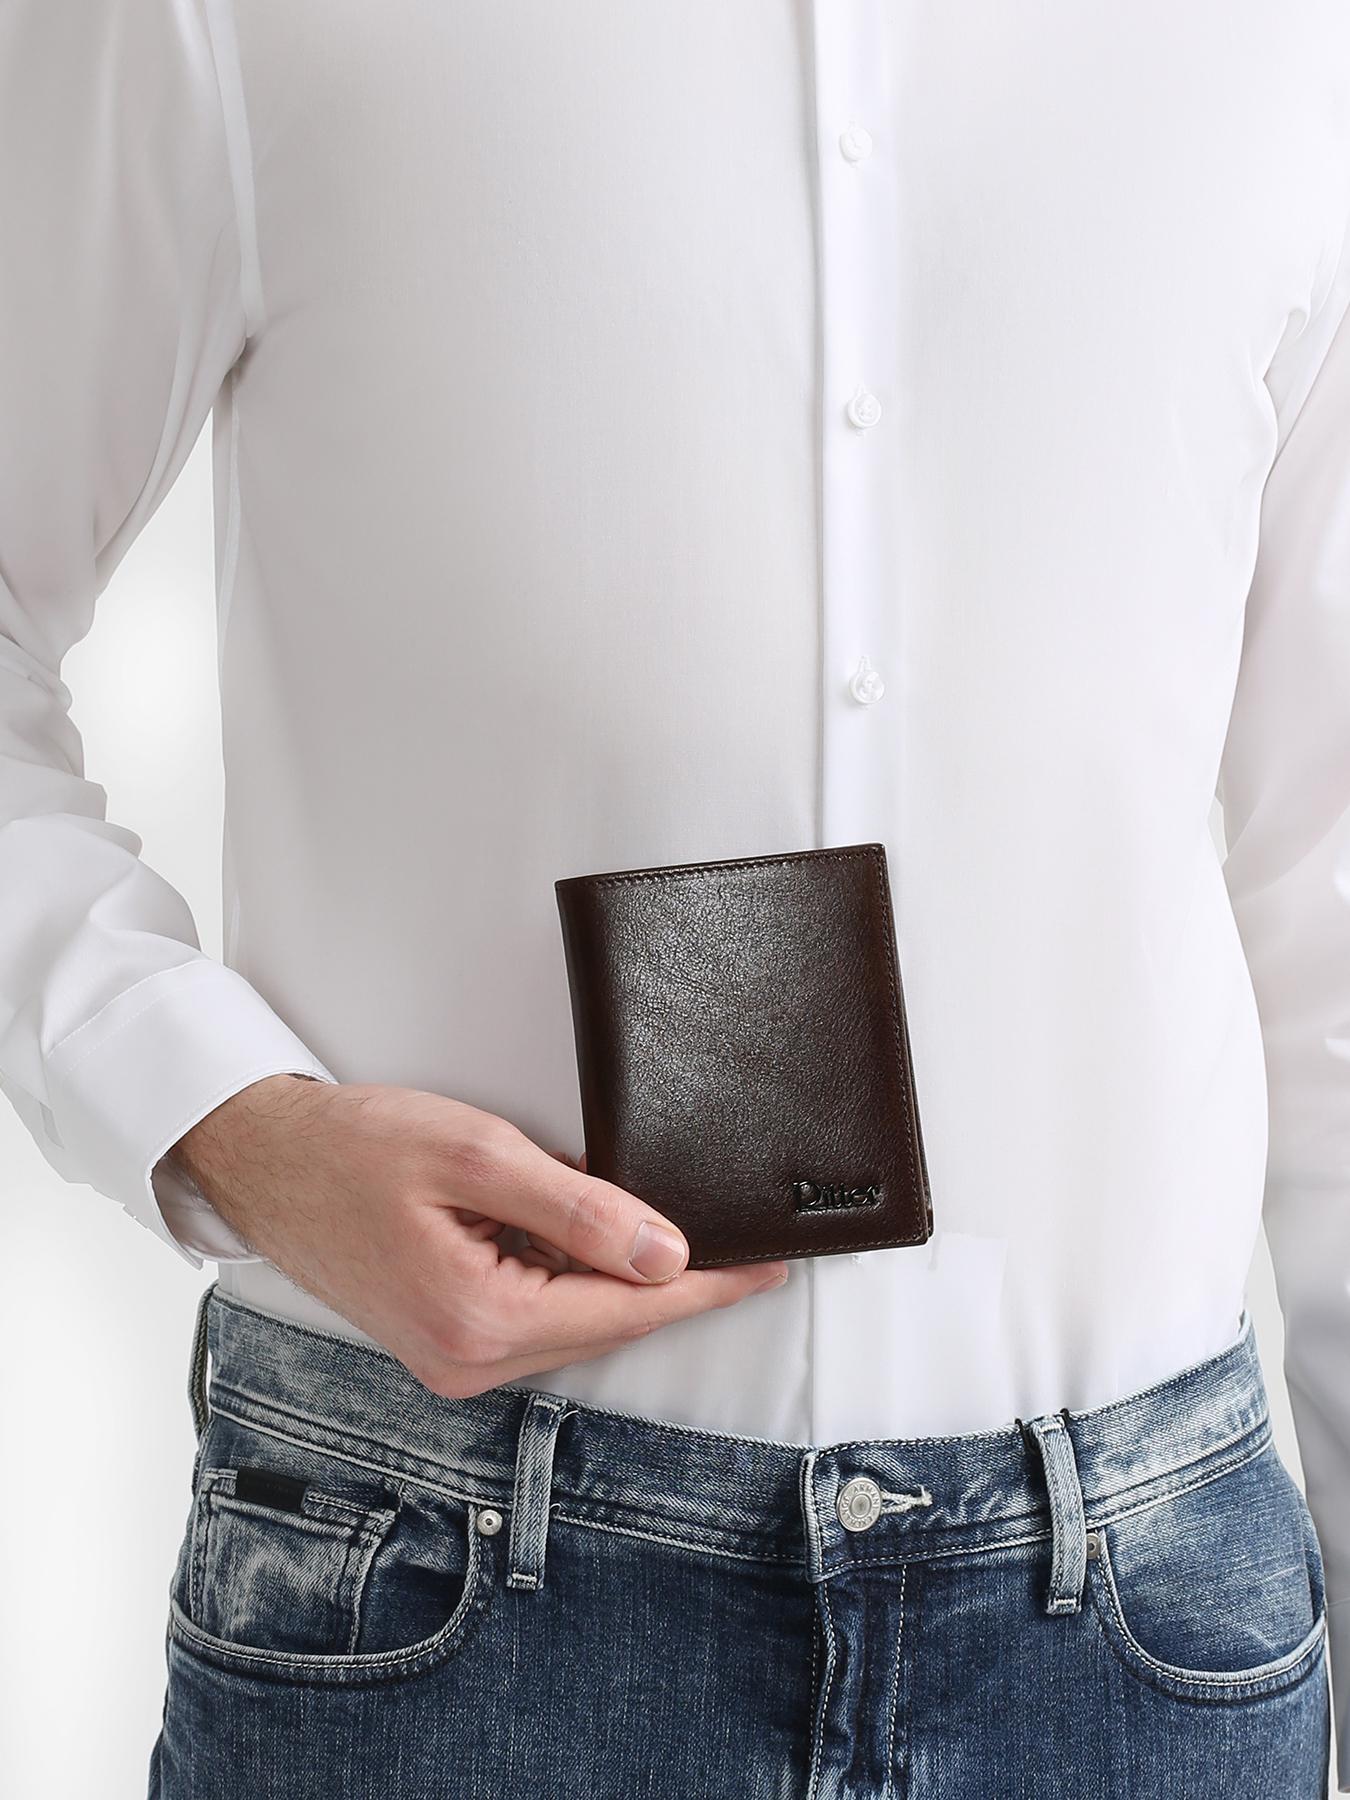 Кошелек Ritter Кожаный кошелек 1шт женщин дамы pu кожаный кошелек длинный кошелек держатель карты сумка clutch сумка